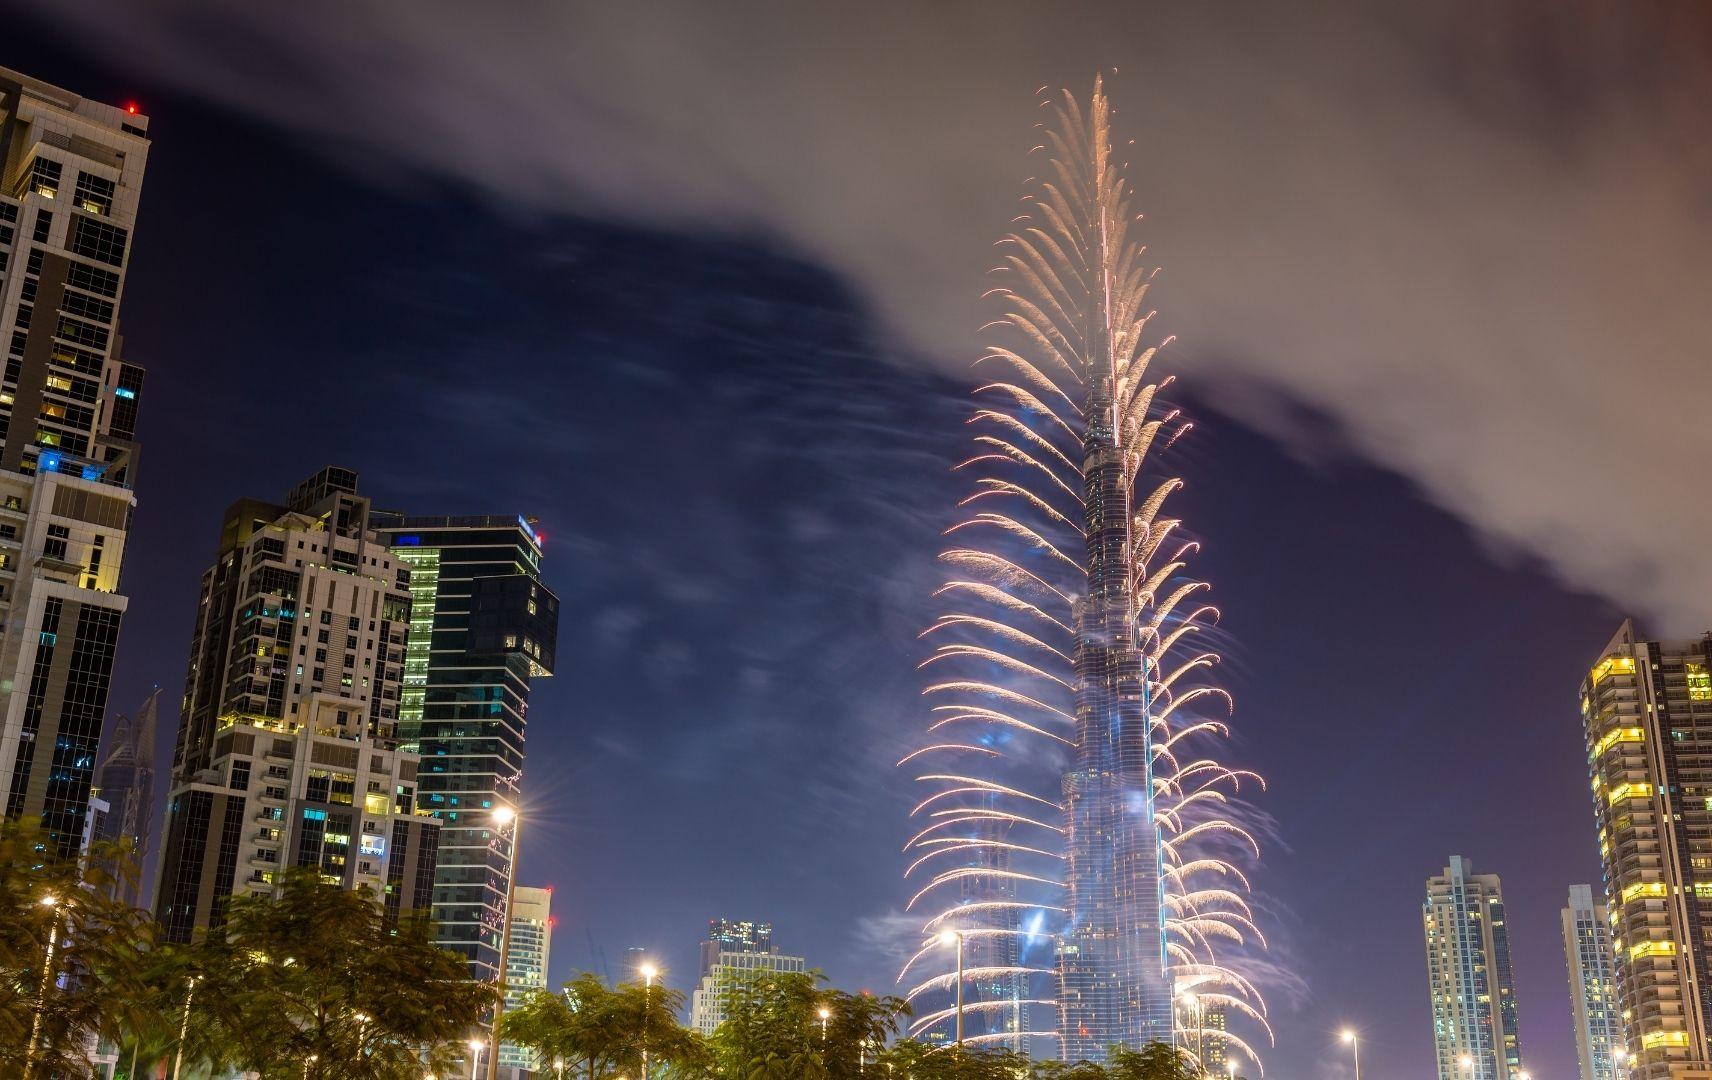 Silvesterurlaub - Dubai Feuerwerk